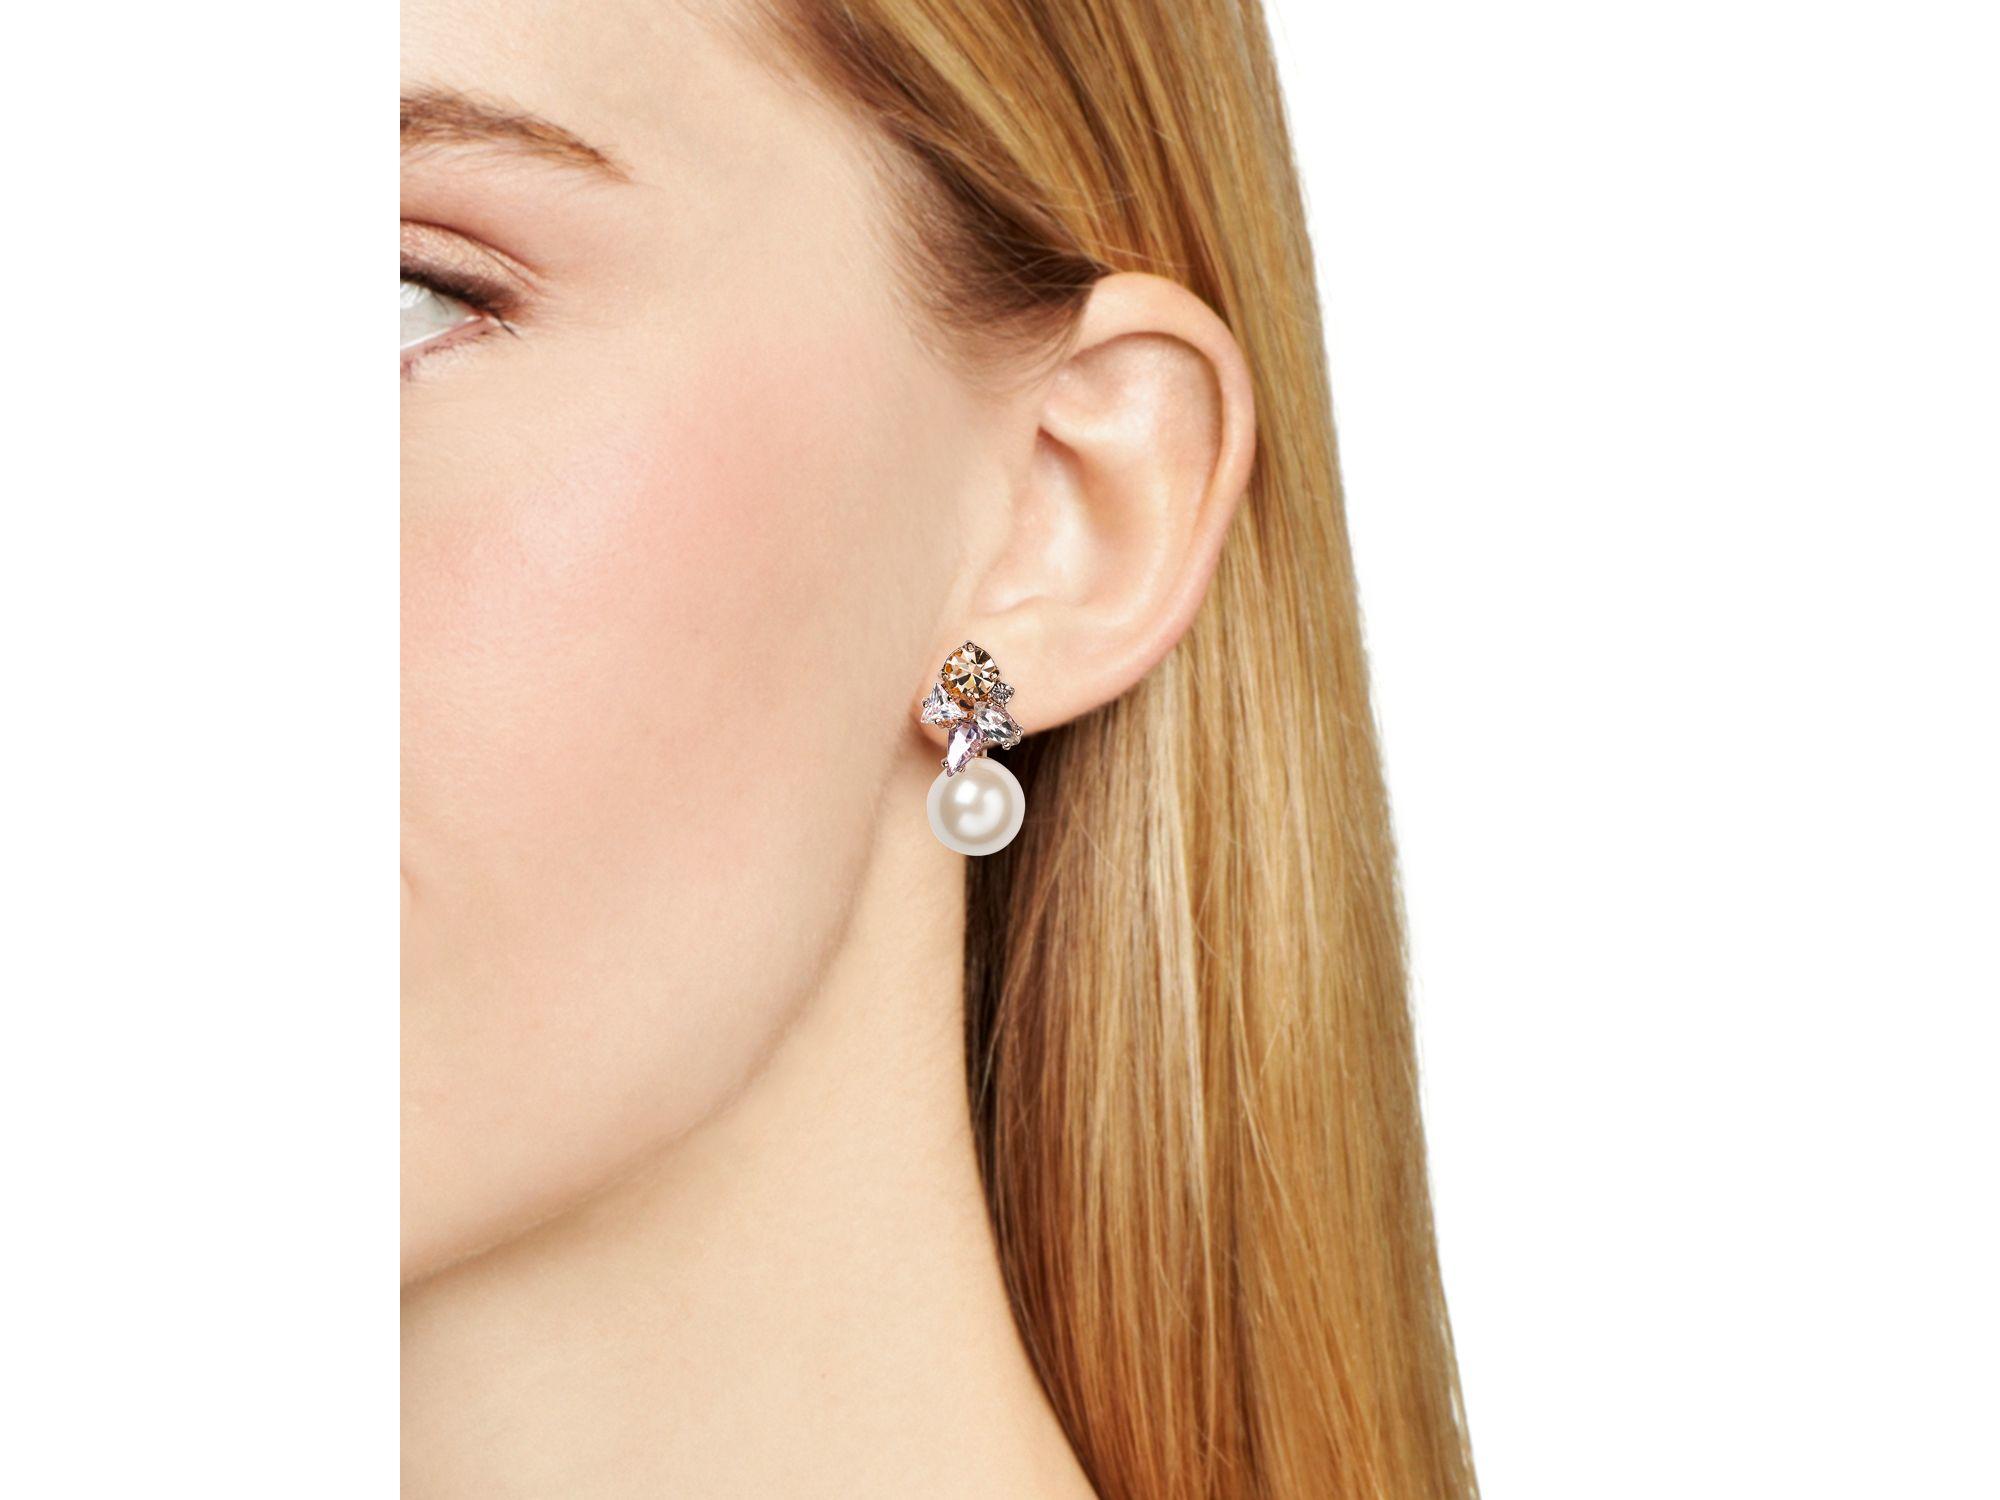 Kate Spade Cluster Ear Jackets in Rose Gold (Pink)